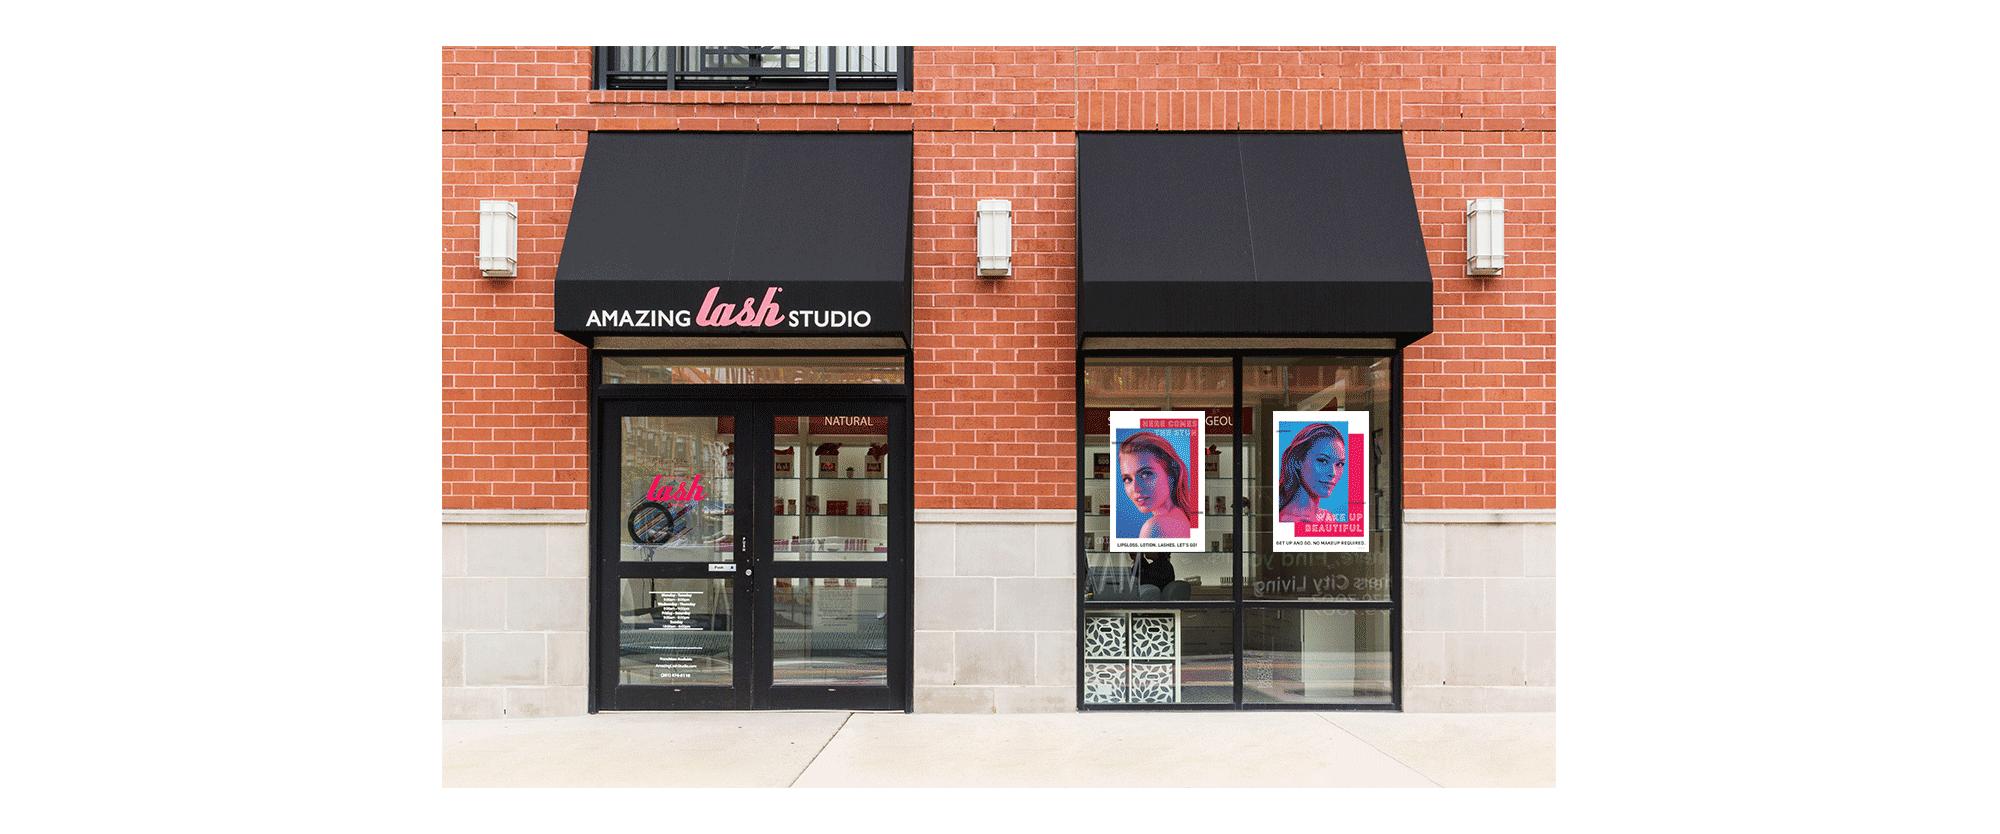 Outside Studio posters